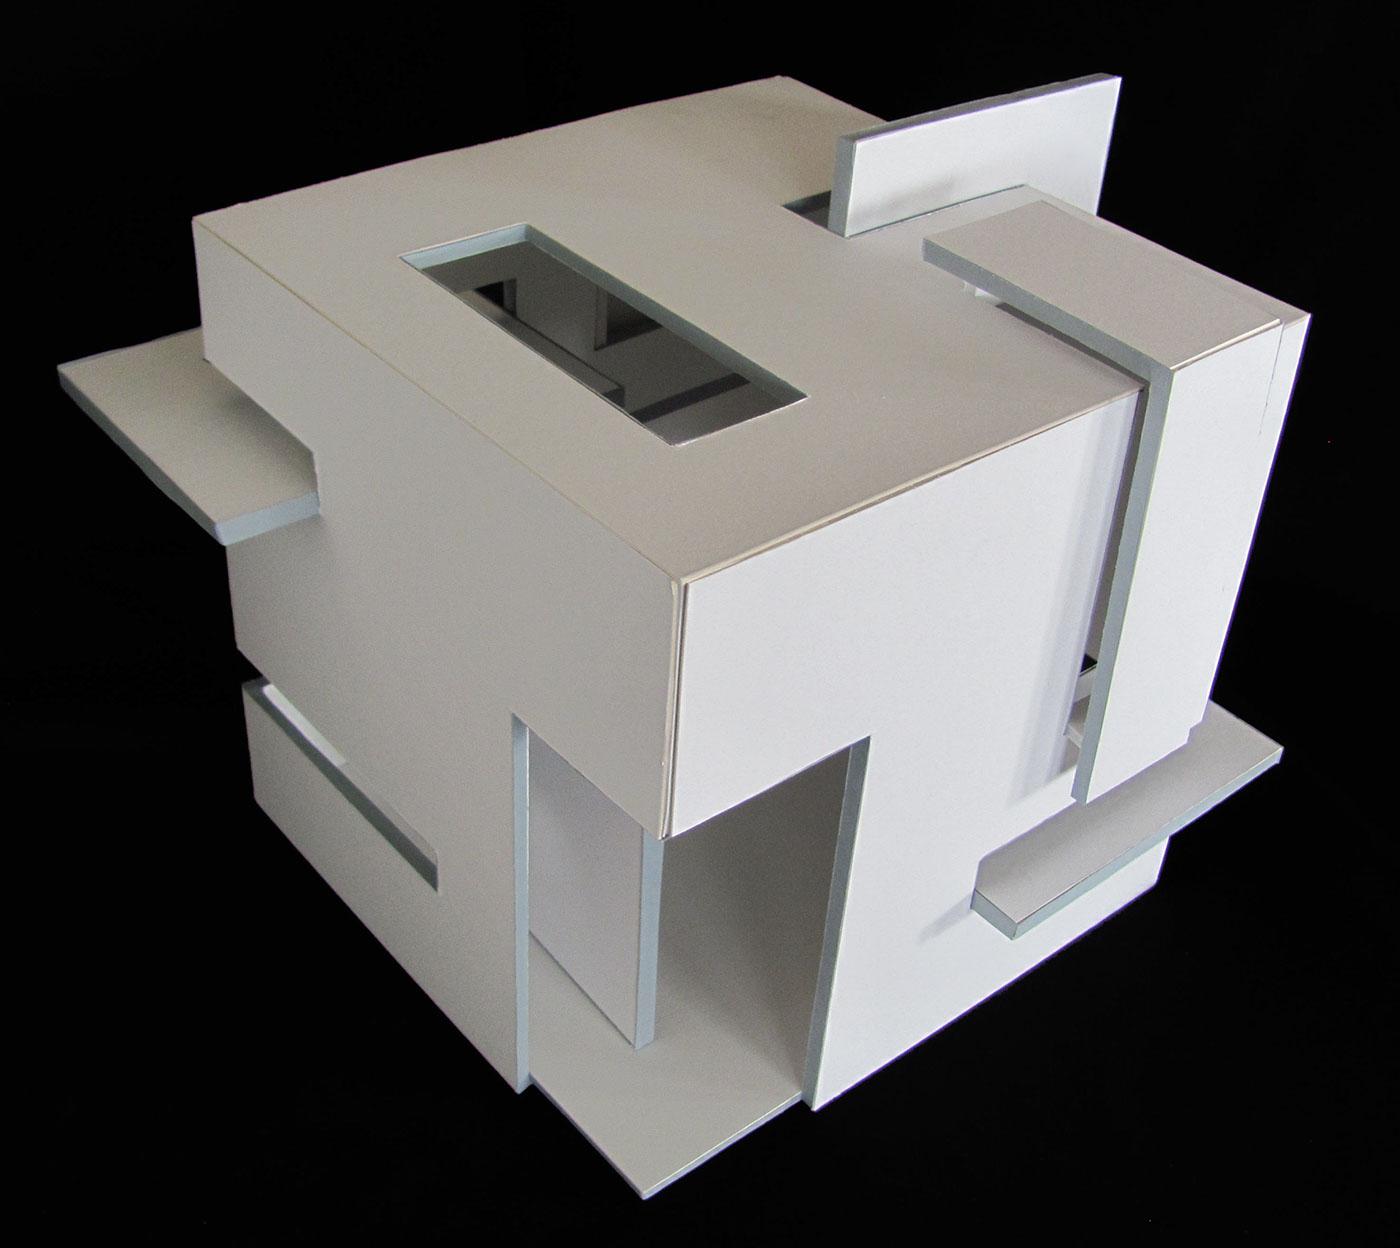 deconstruct cube prerequisite studio summer 2011 on behance. Black Bedroom Furniture Sets. Home Design Ideas